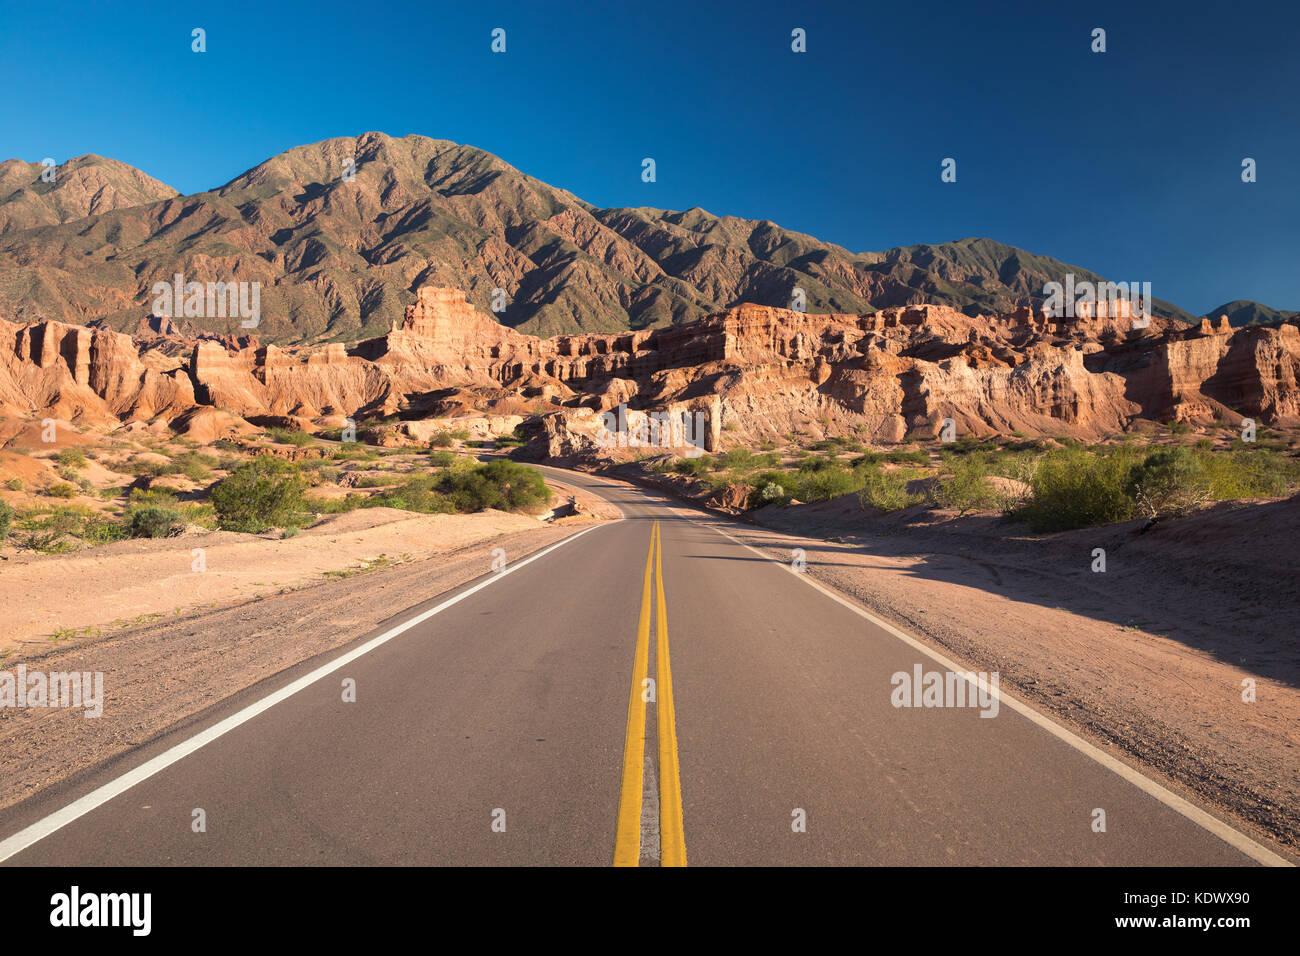 The road down the Quebrada de la Conches, Valles Calchaquies, Salta Province, Argentina Stock Photo